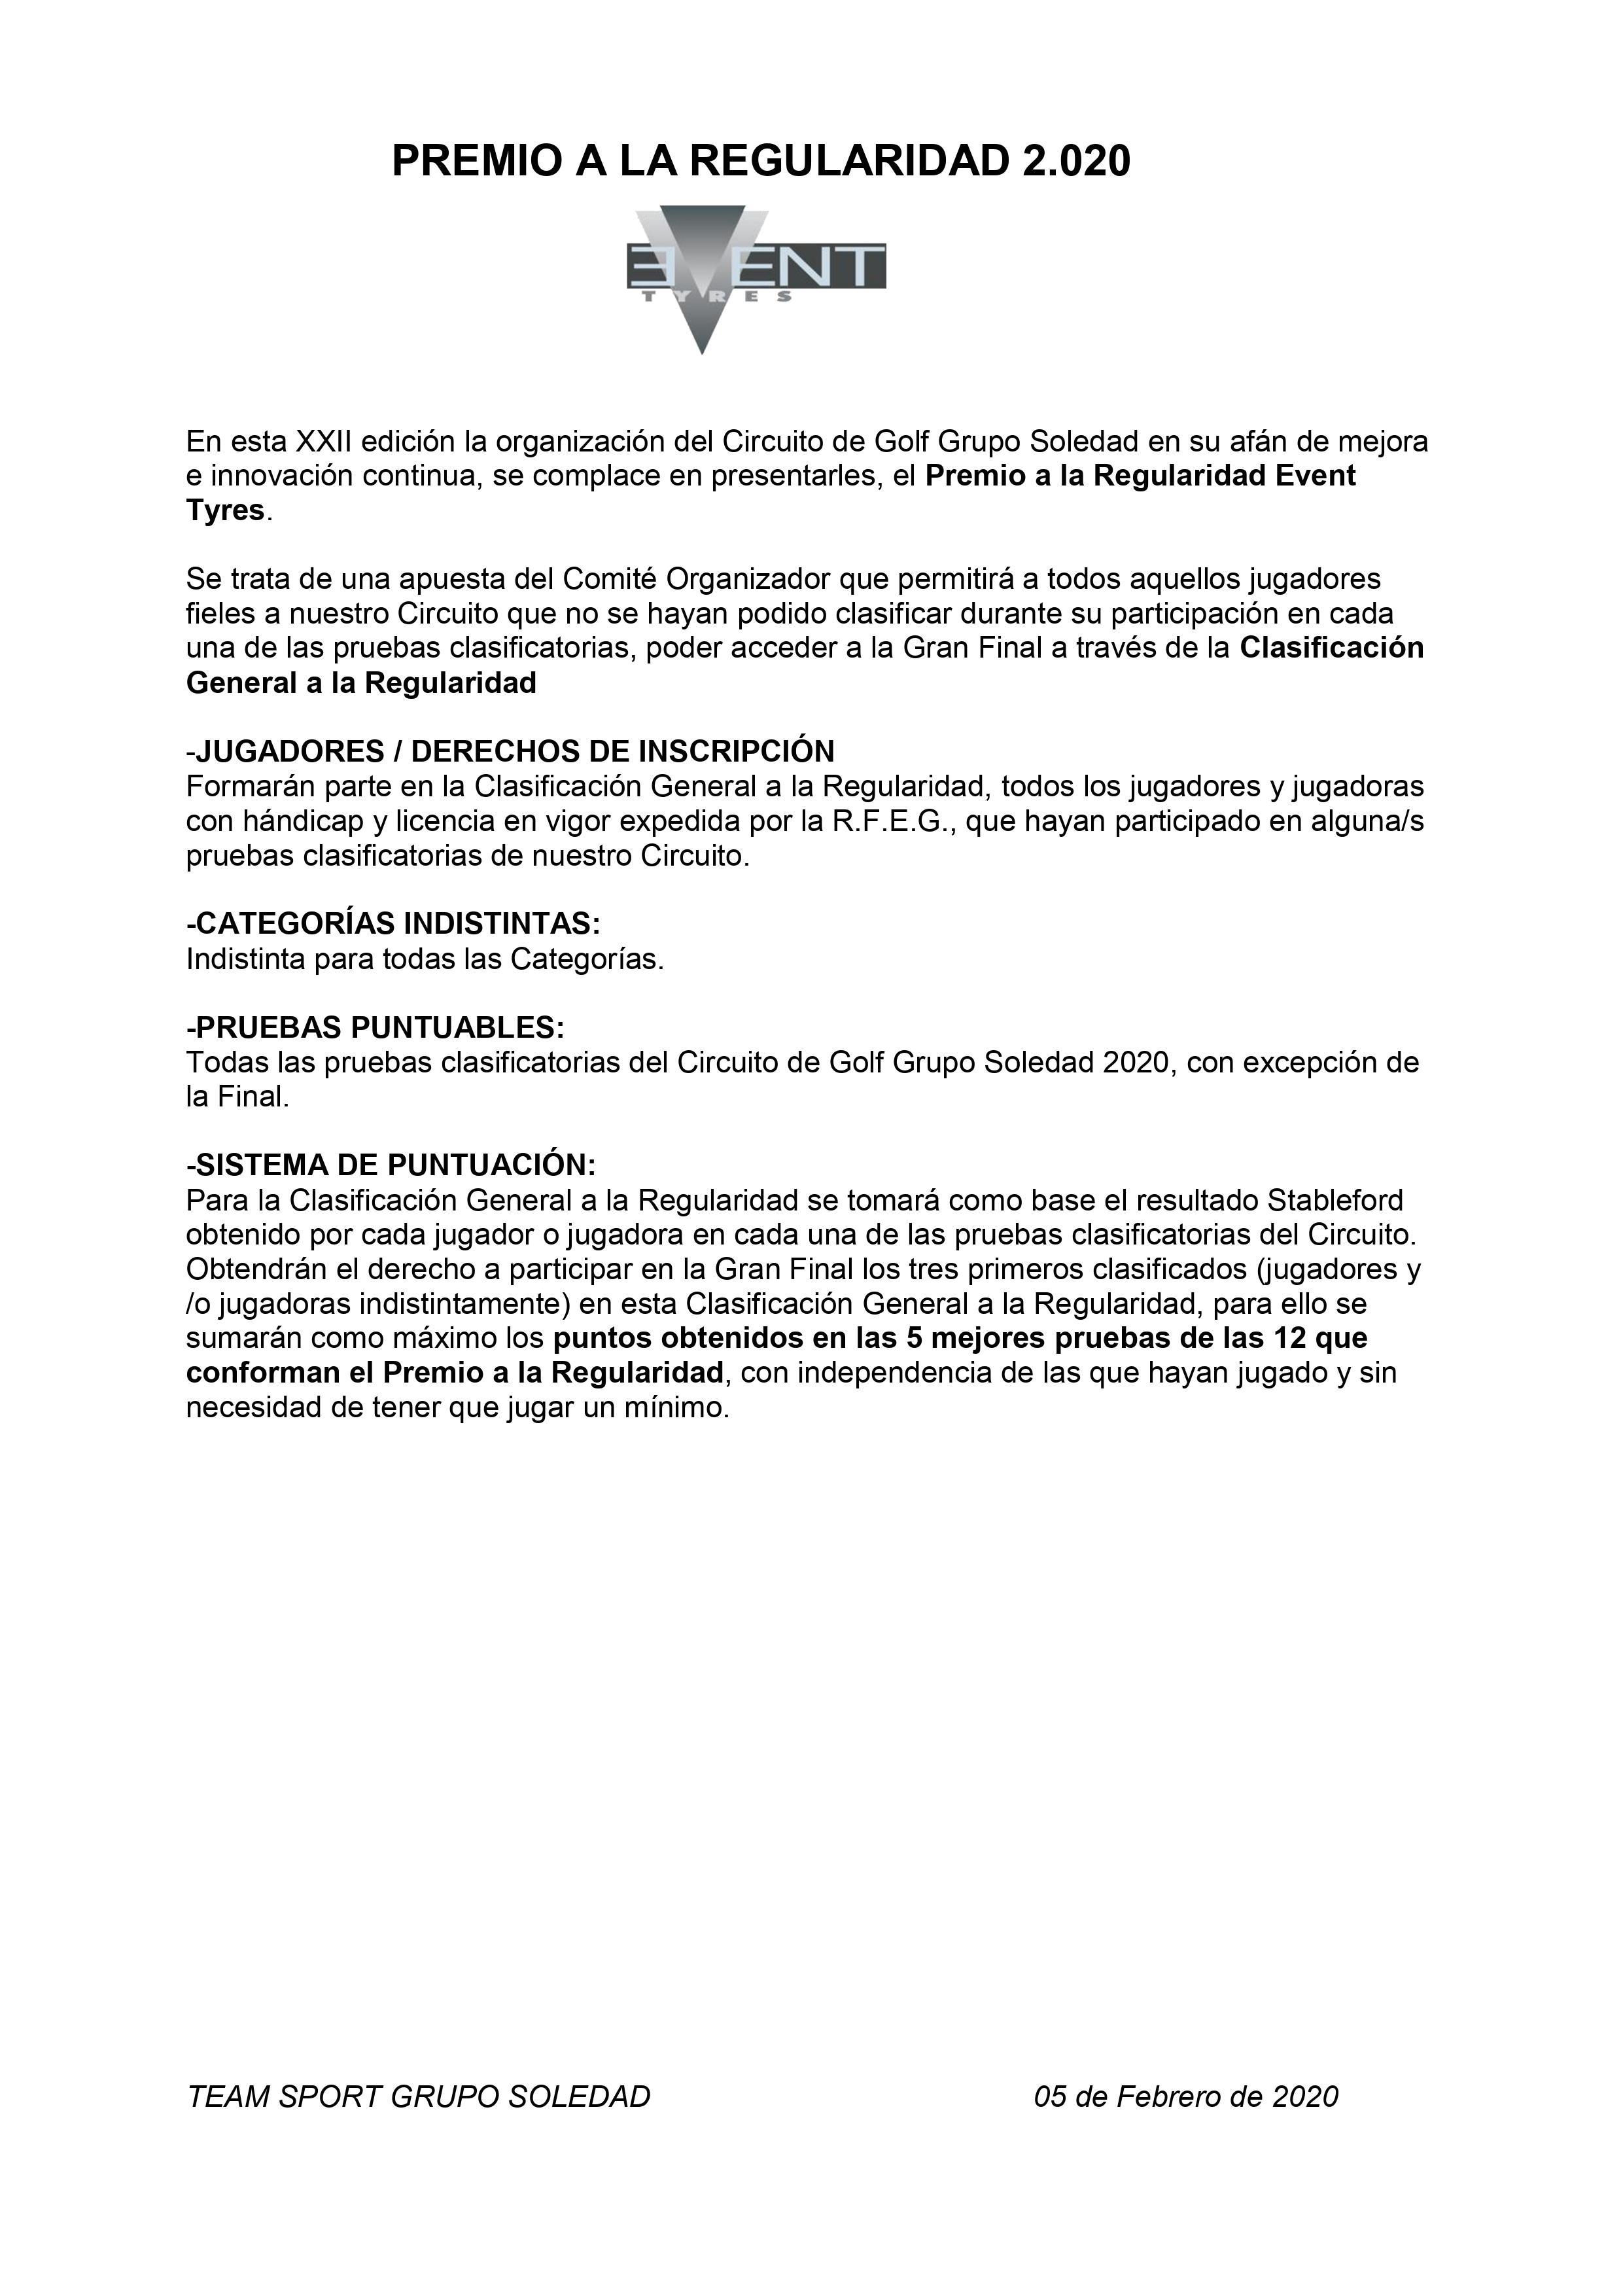 200328 PLA, Reglamento del circuito (5)